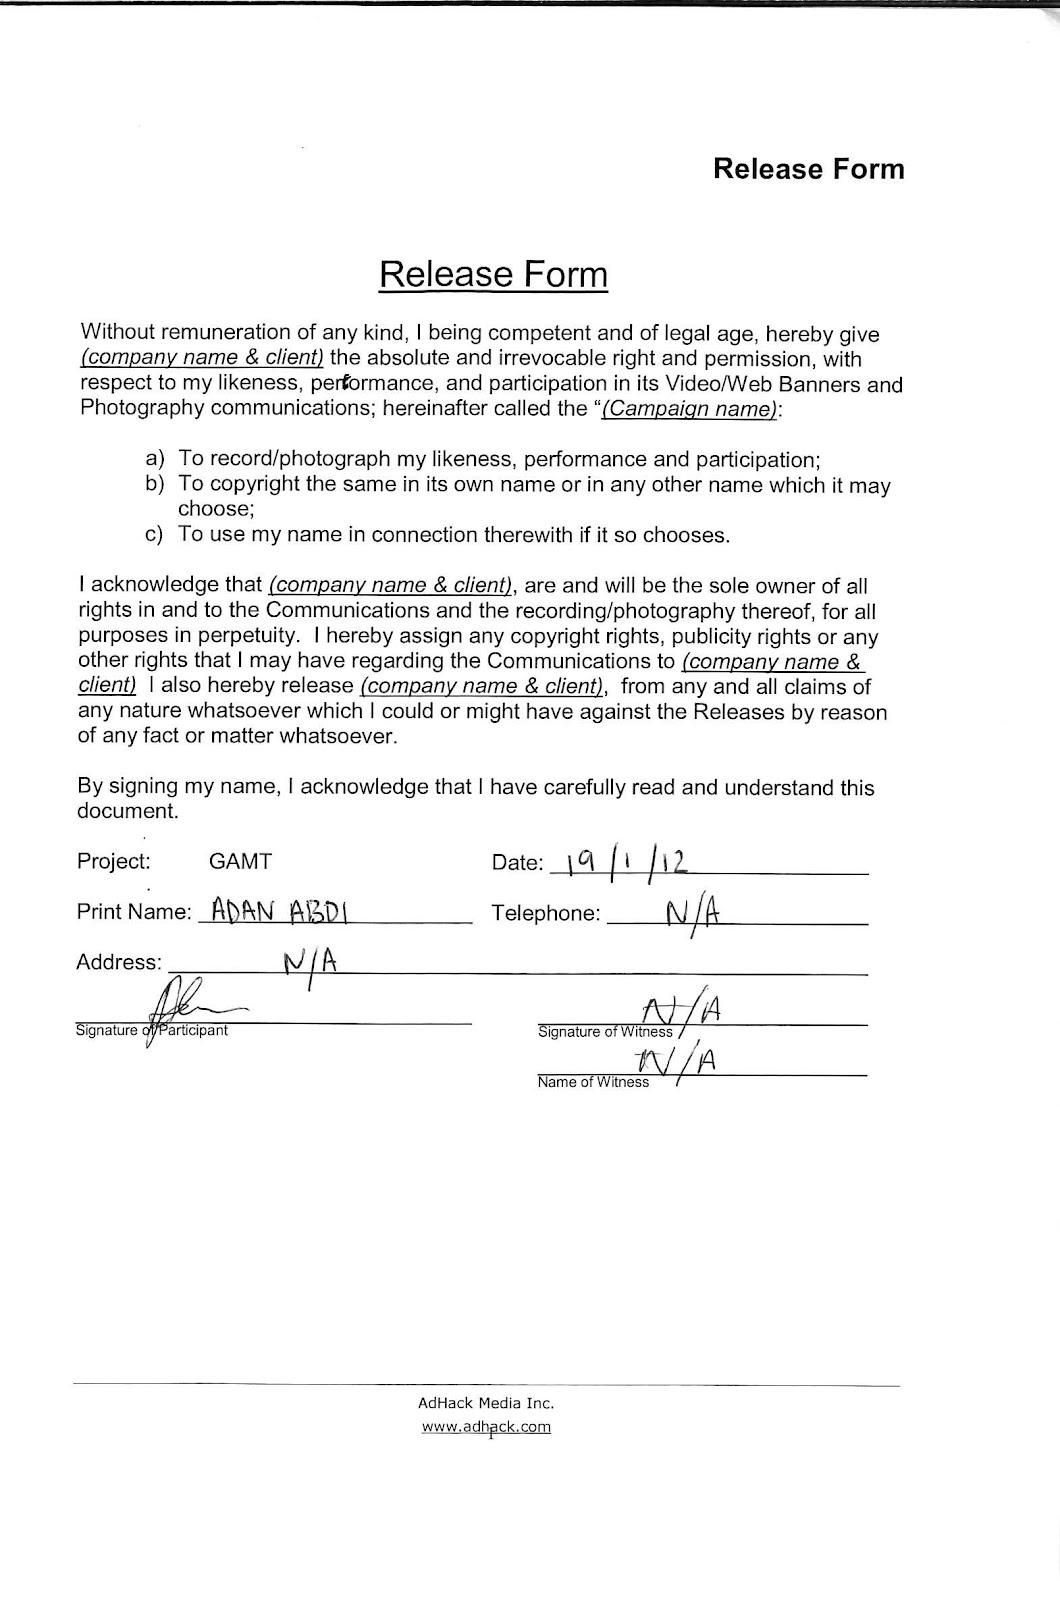 Actor Release Form | Group Work Coursework Media Adan Tom Gabby Melique Adan Abdi